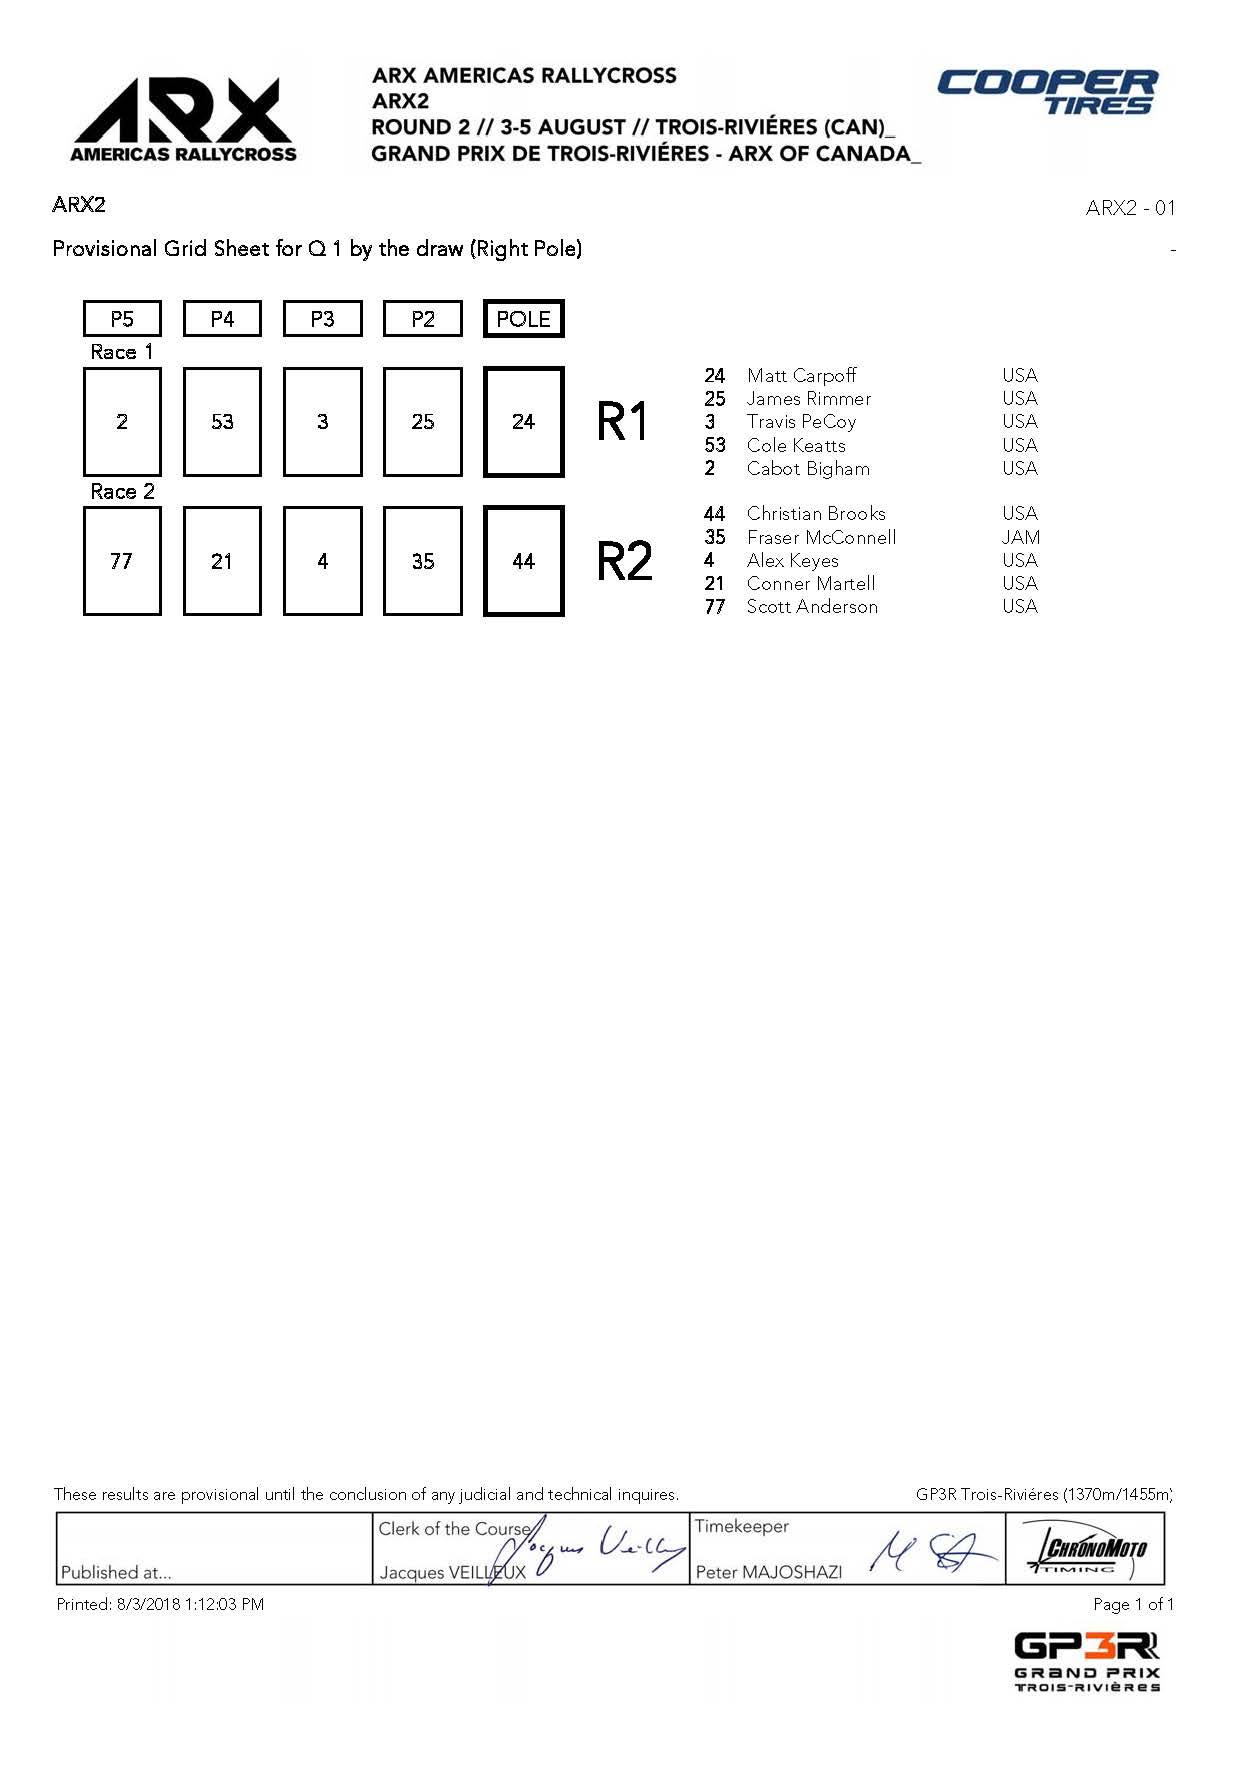 arx2d1_q1_grid.jpg